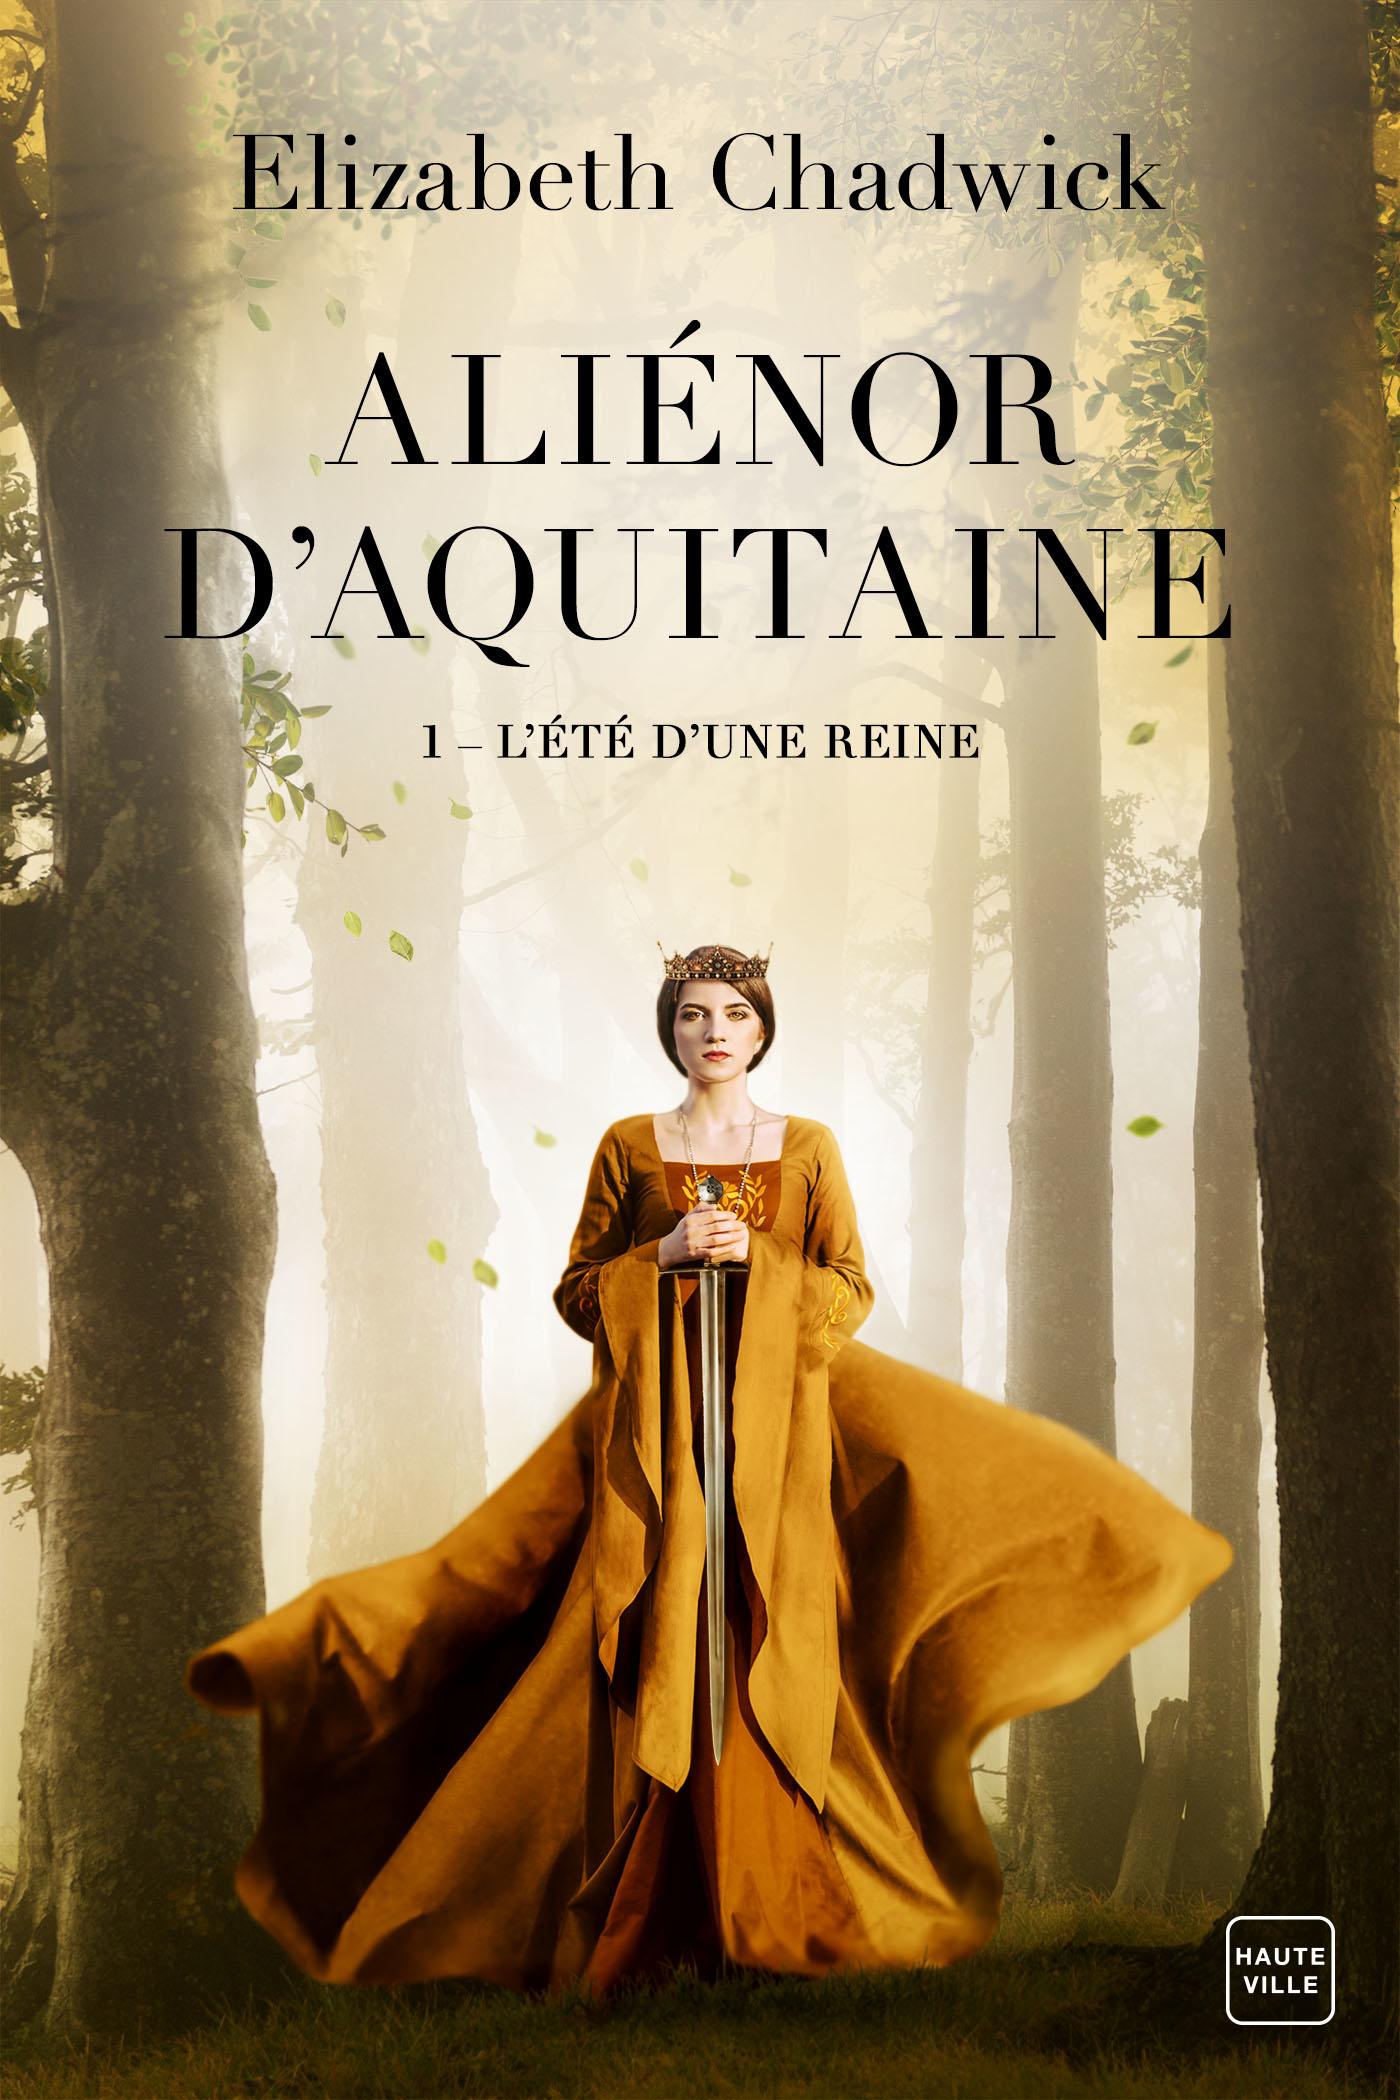 cdn1.booknode.com/book_cover/1292/full/alienor-d-aquitaine-tome-1-l-ete-d-une-reine-1291743.jpg